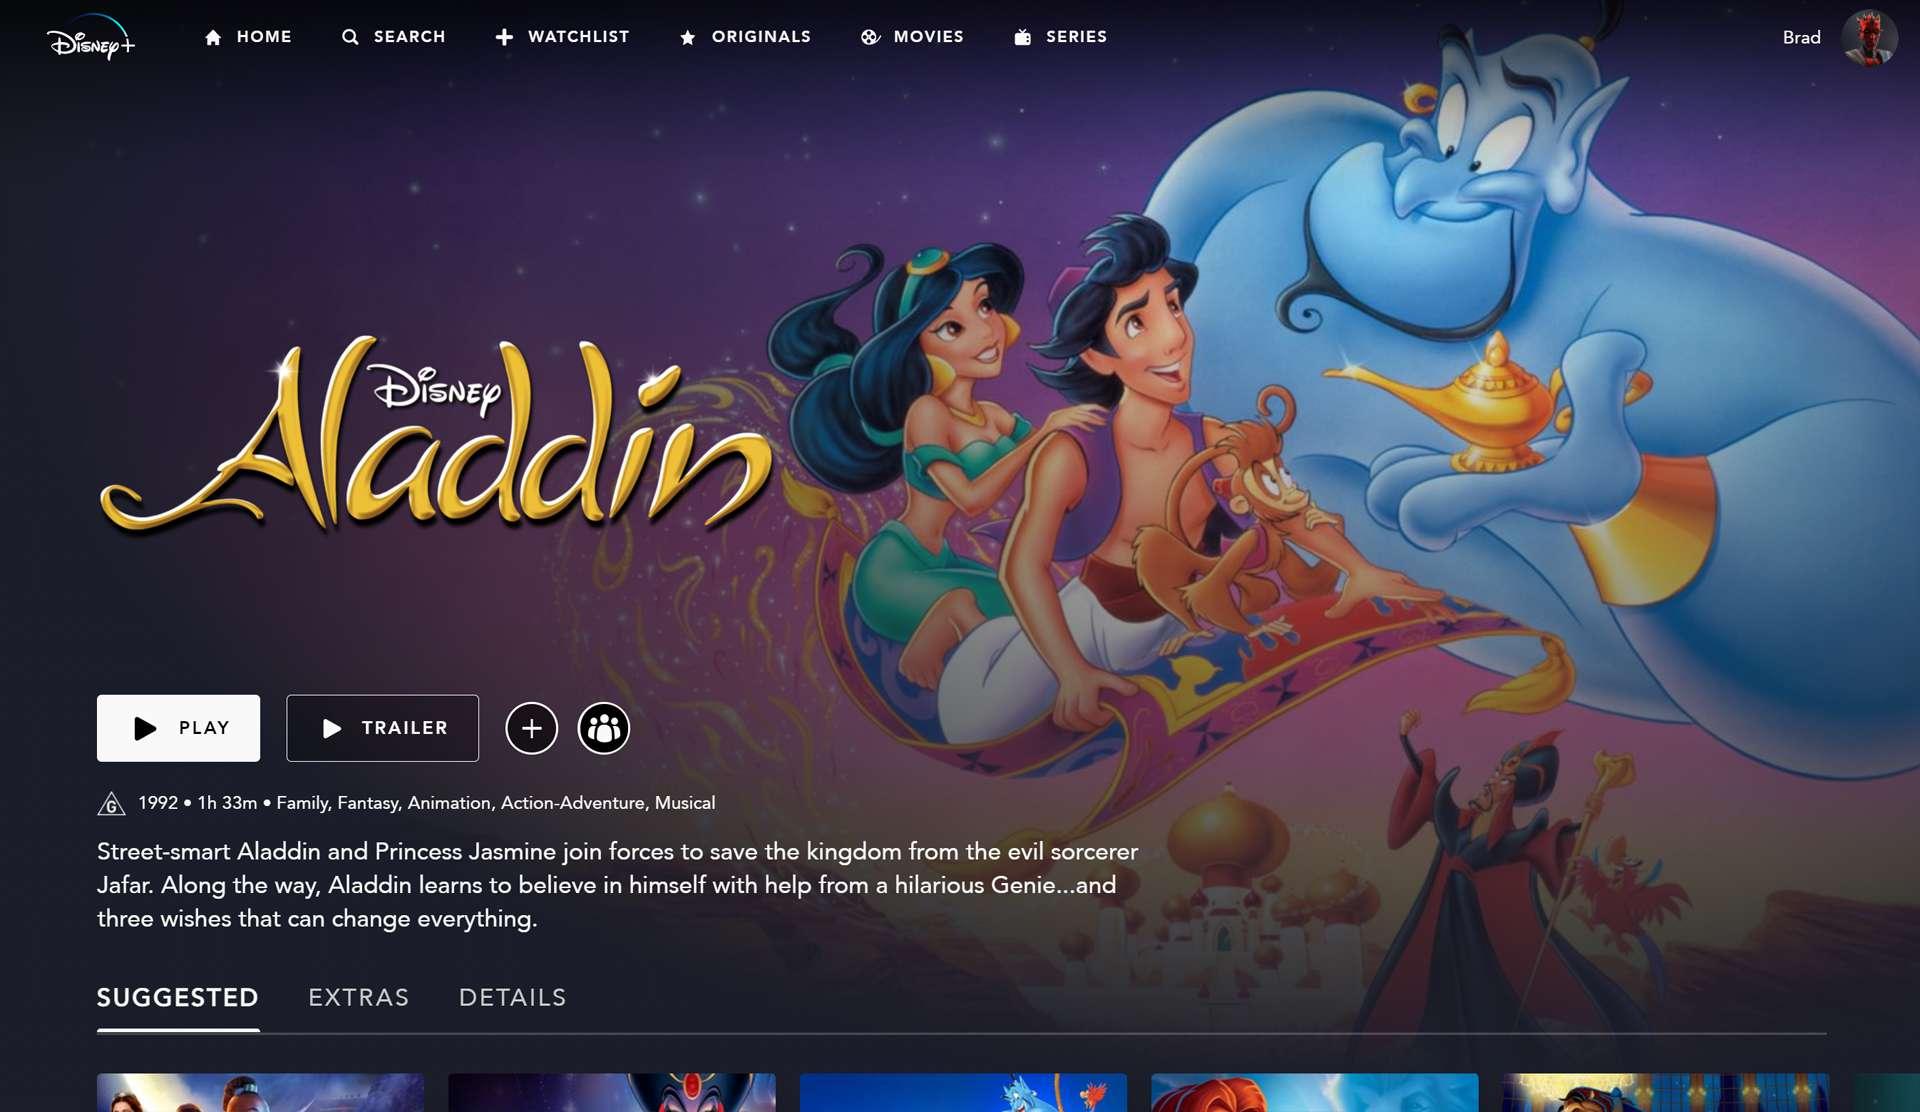 Disney's Aladdin animated film on Disney Plus app and streaming service.